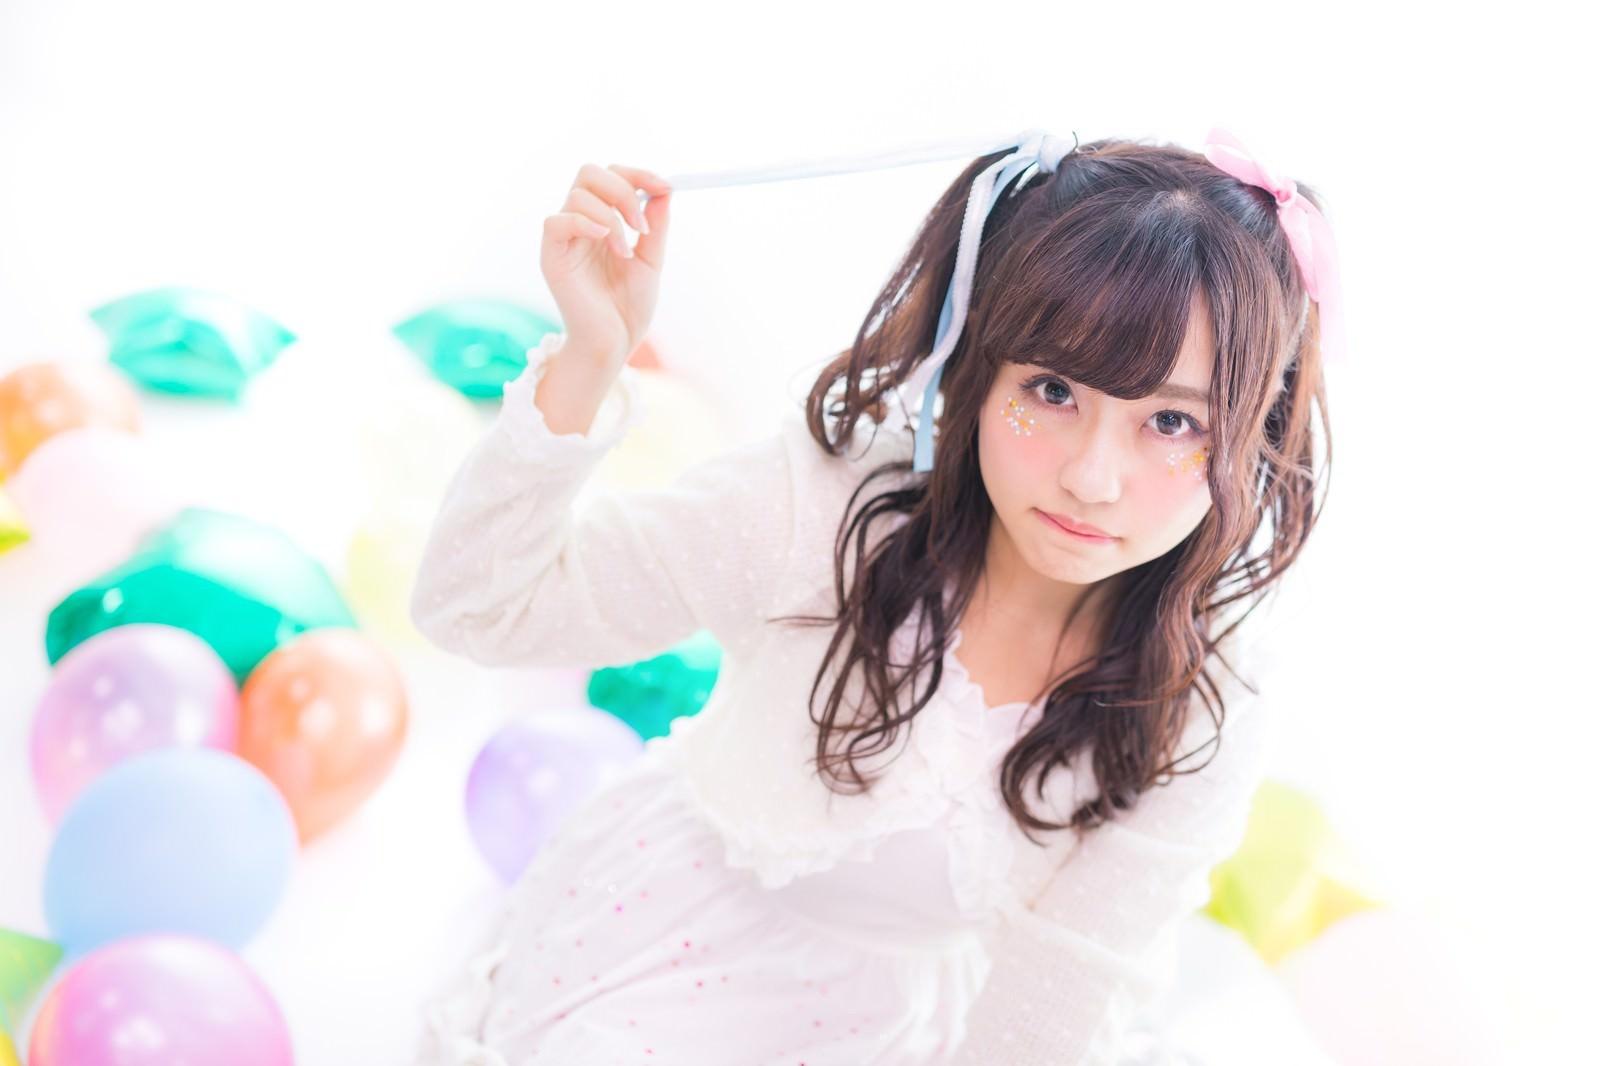 Yuka Kawamura Free Stock Photo Idol 07